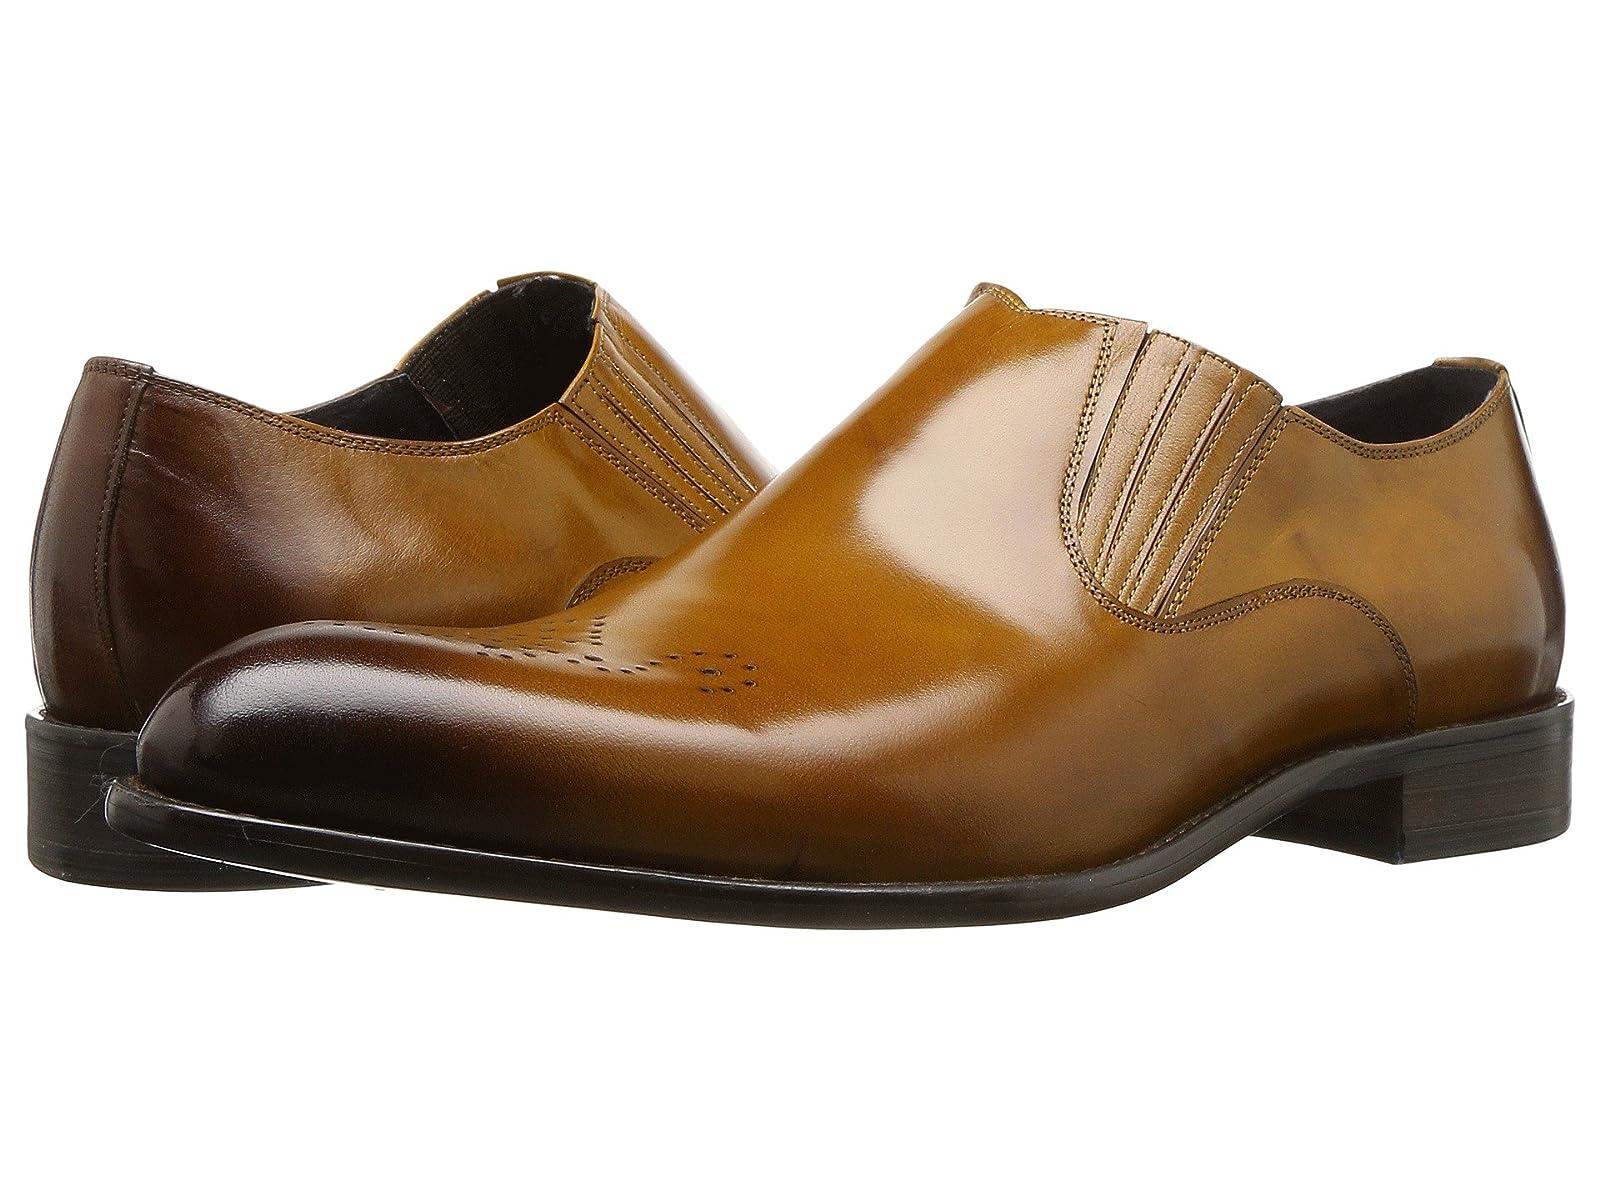 Carrucci MilesAtmospheric grades have affordable shoes